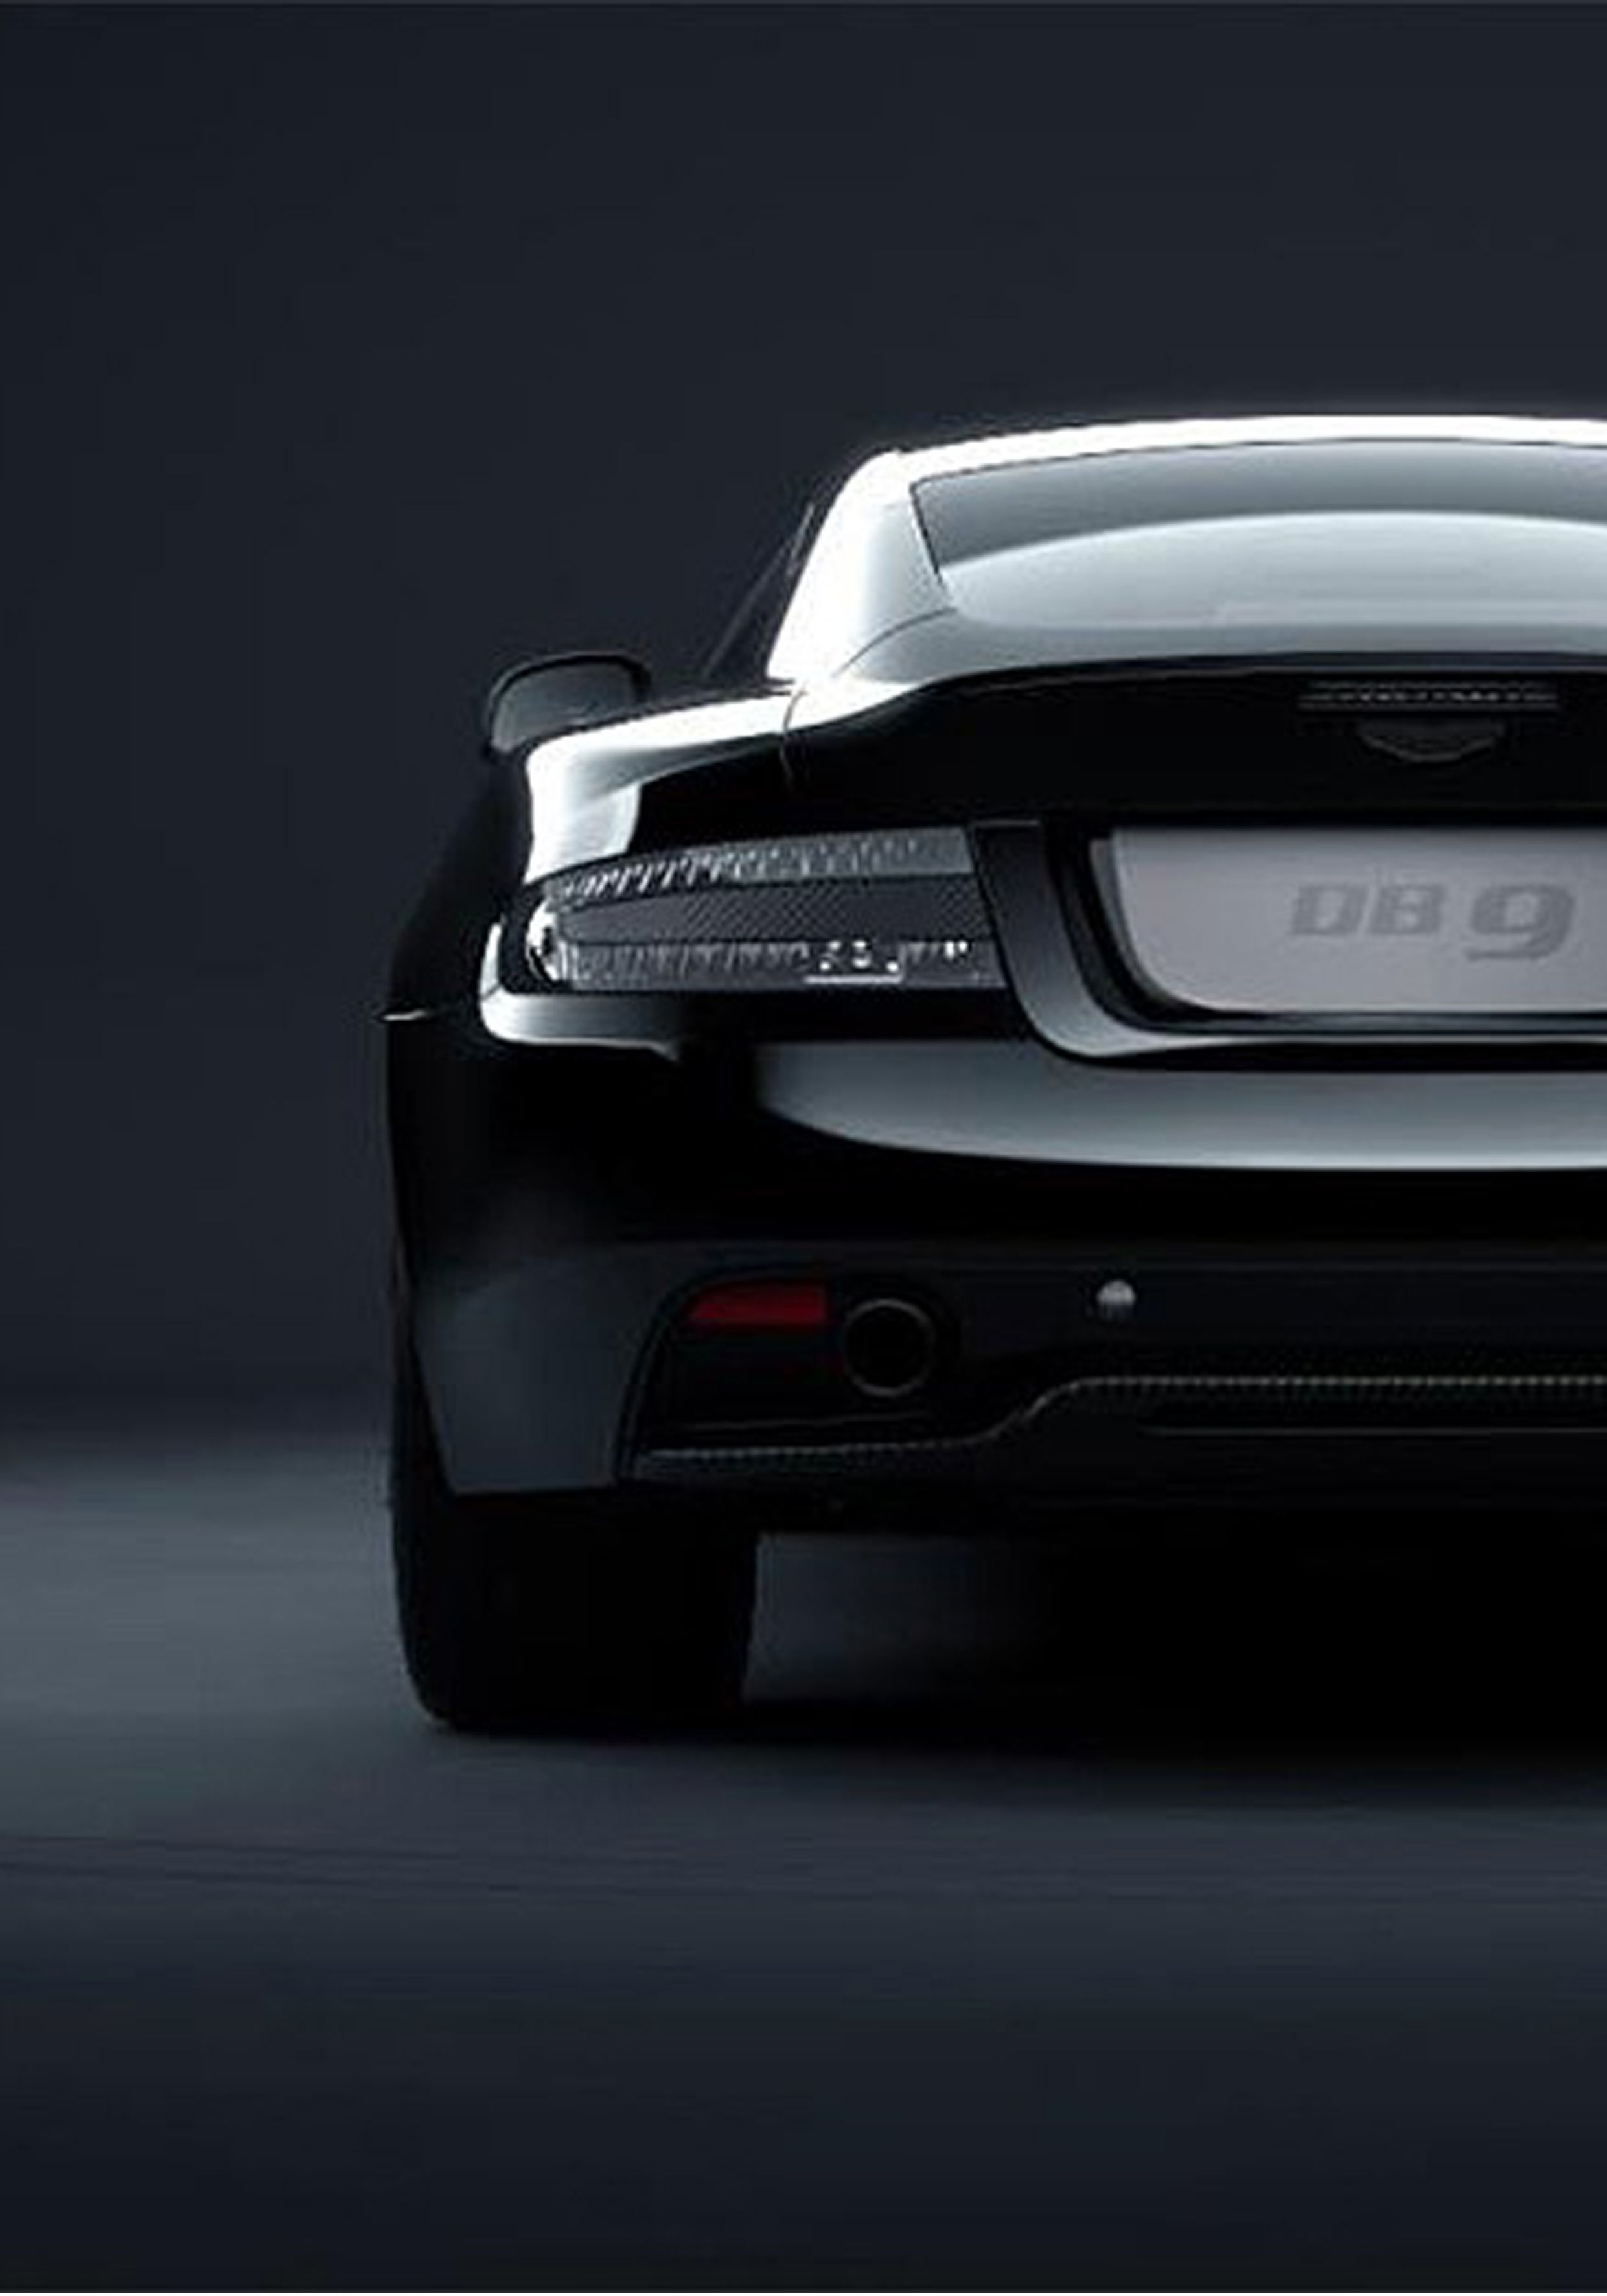 Aston Martin In 2020 Aston Martin Sports Cars Luxury Super Cars